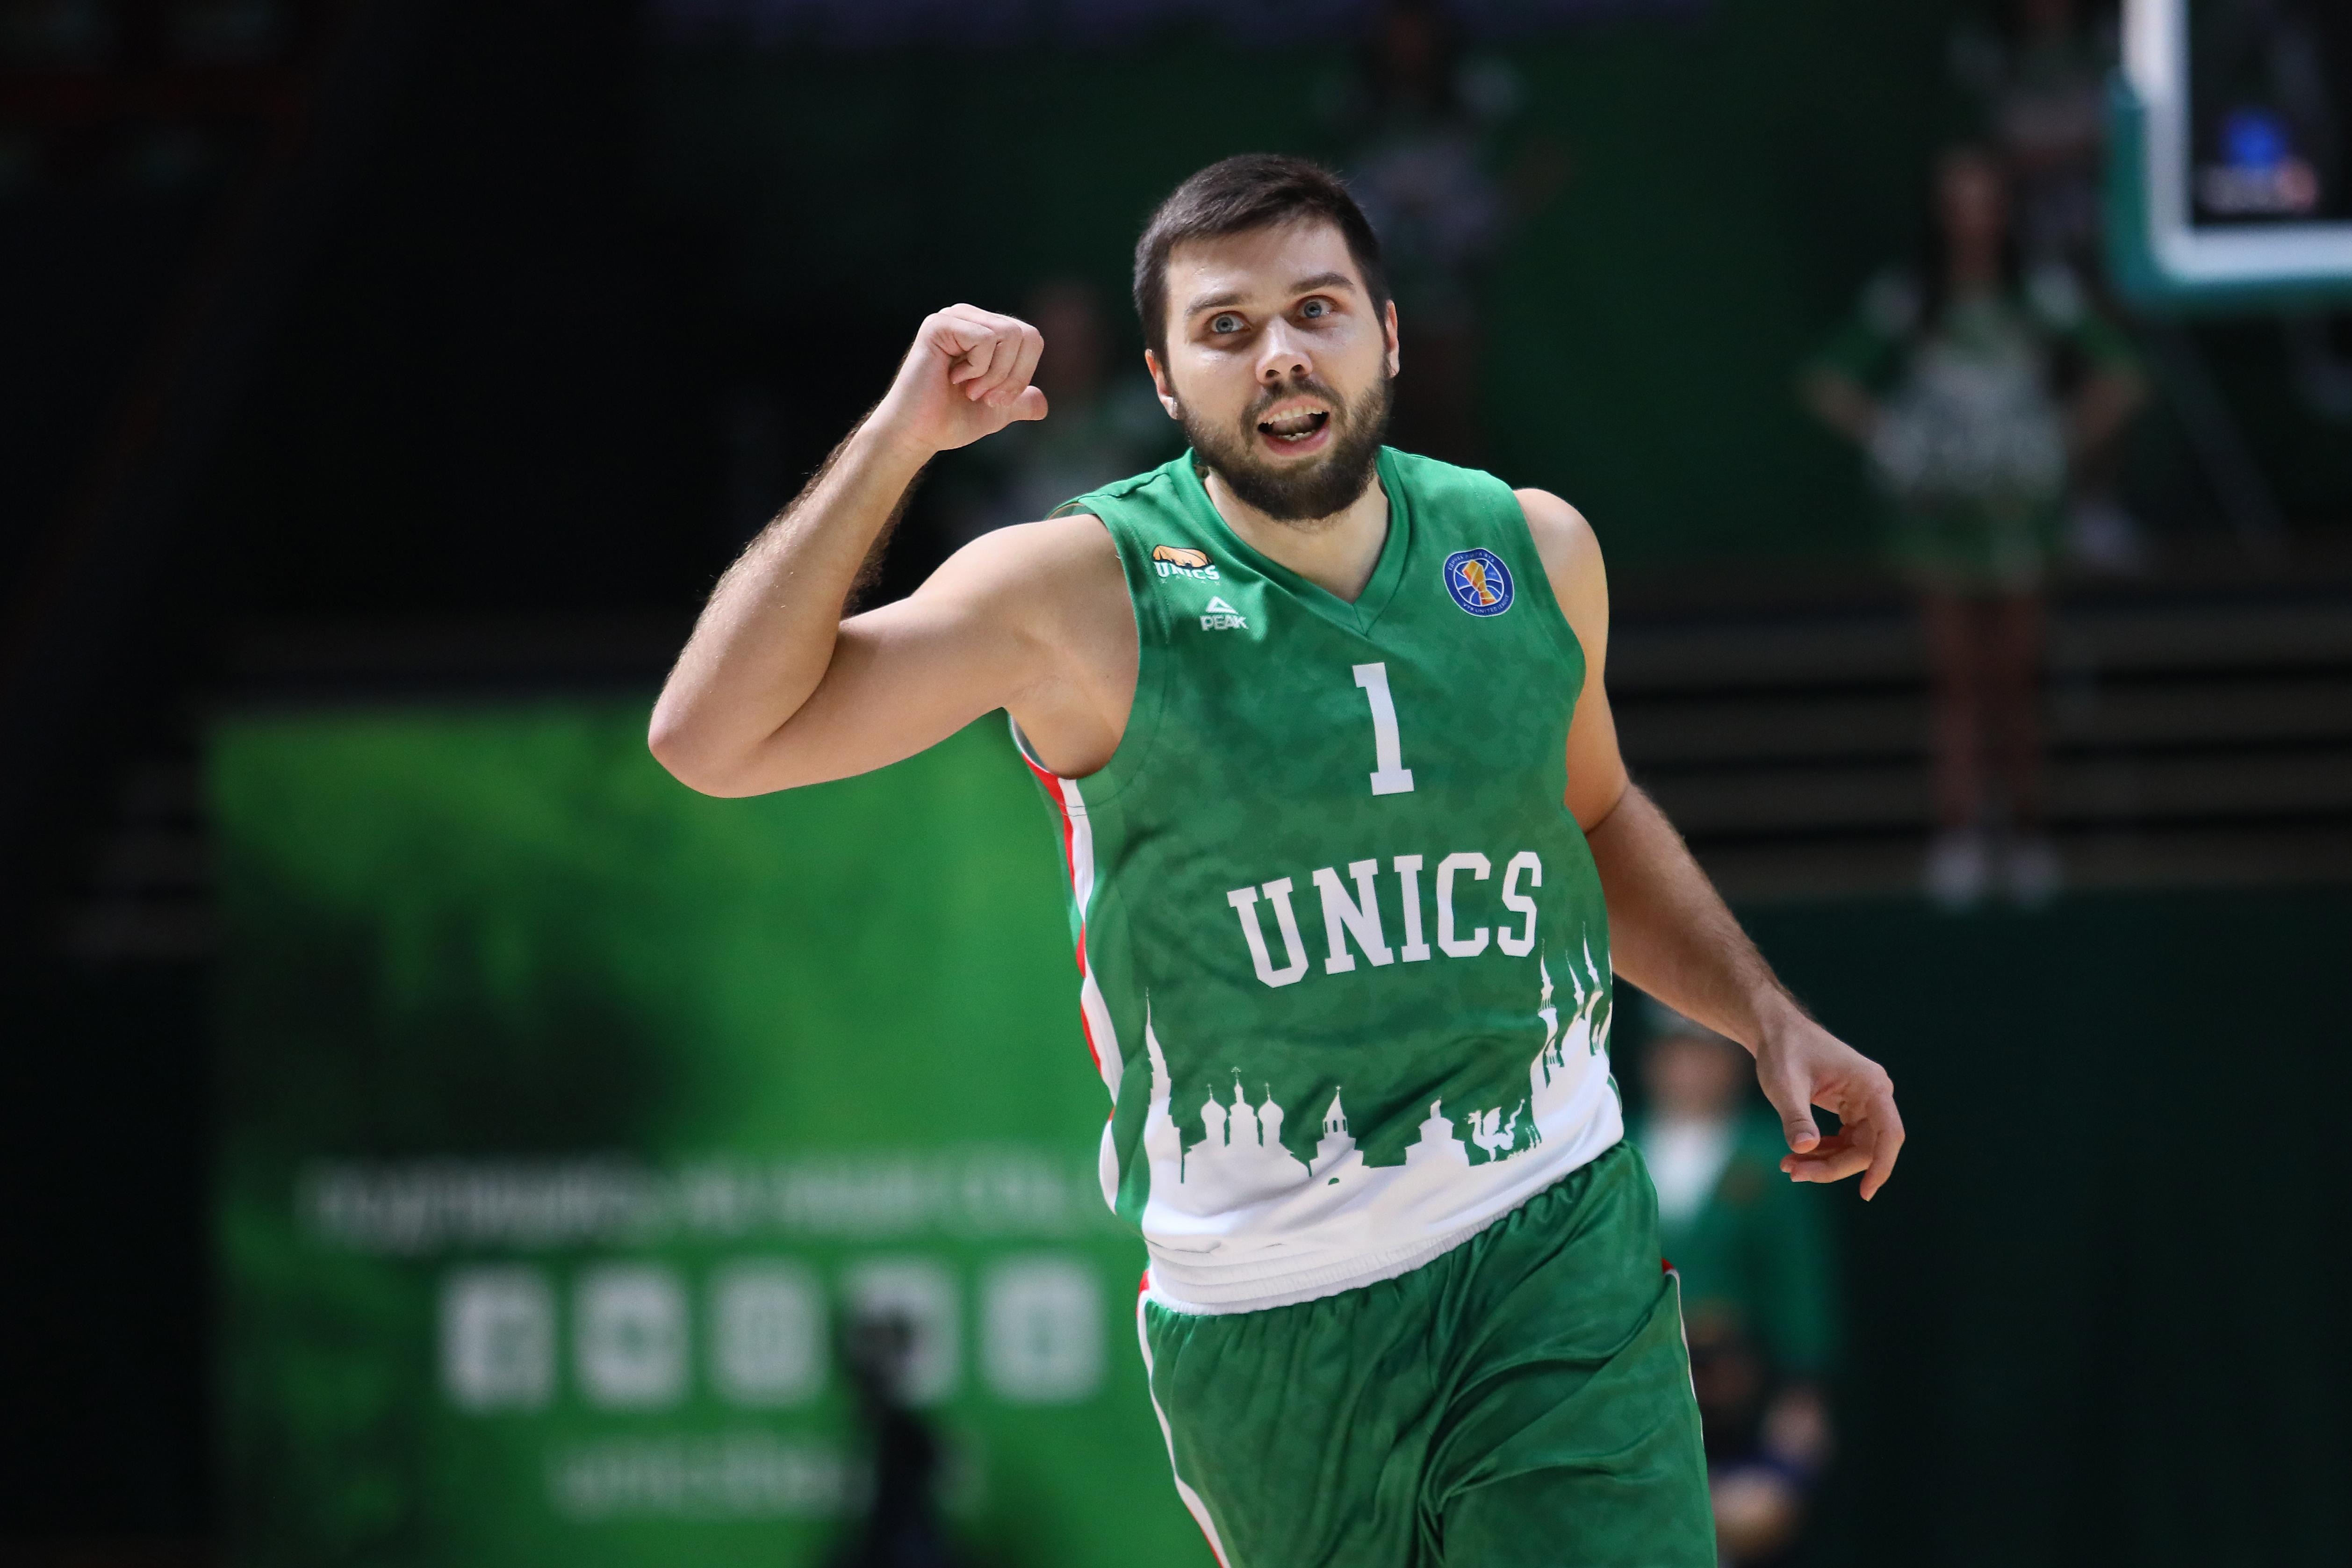 07/12/2019 UNICS-Zielona Gora 86:73